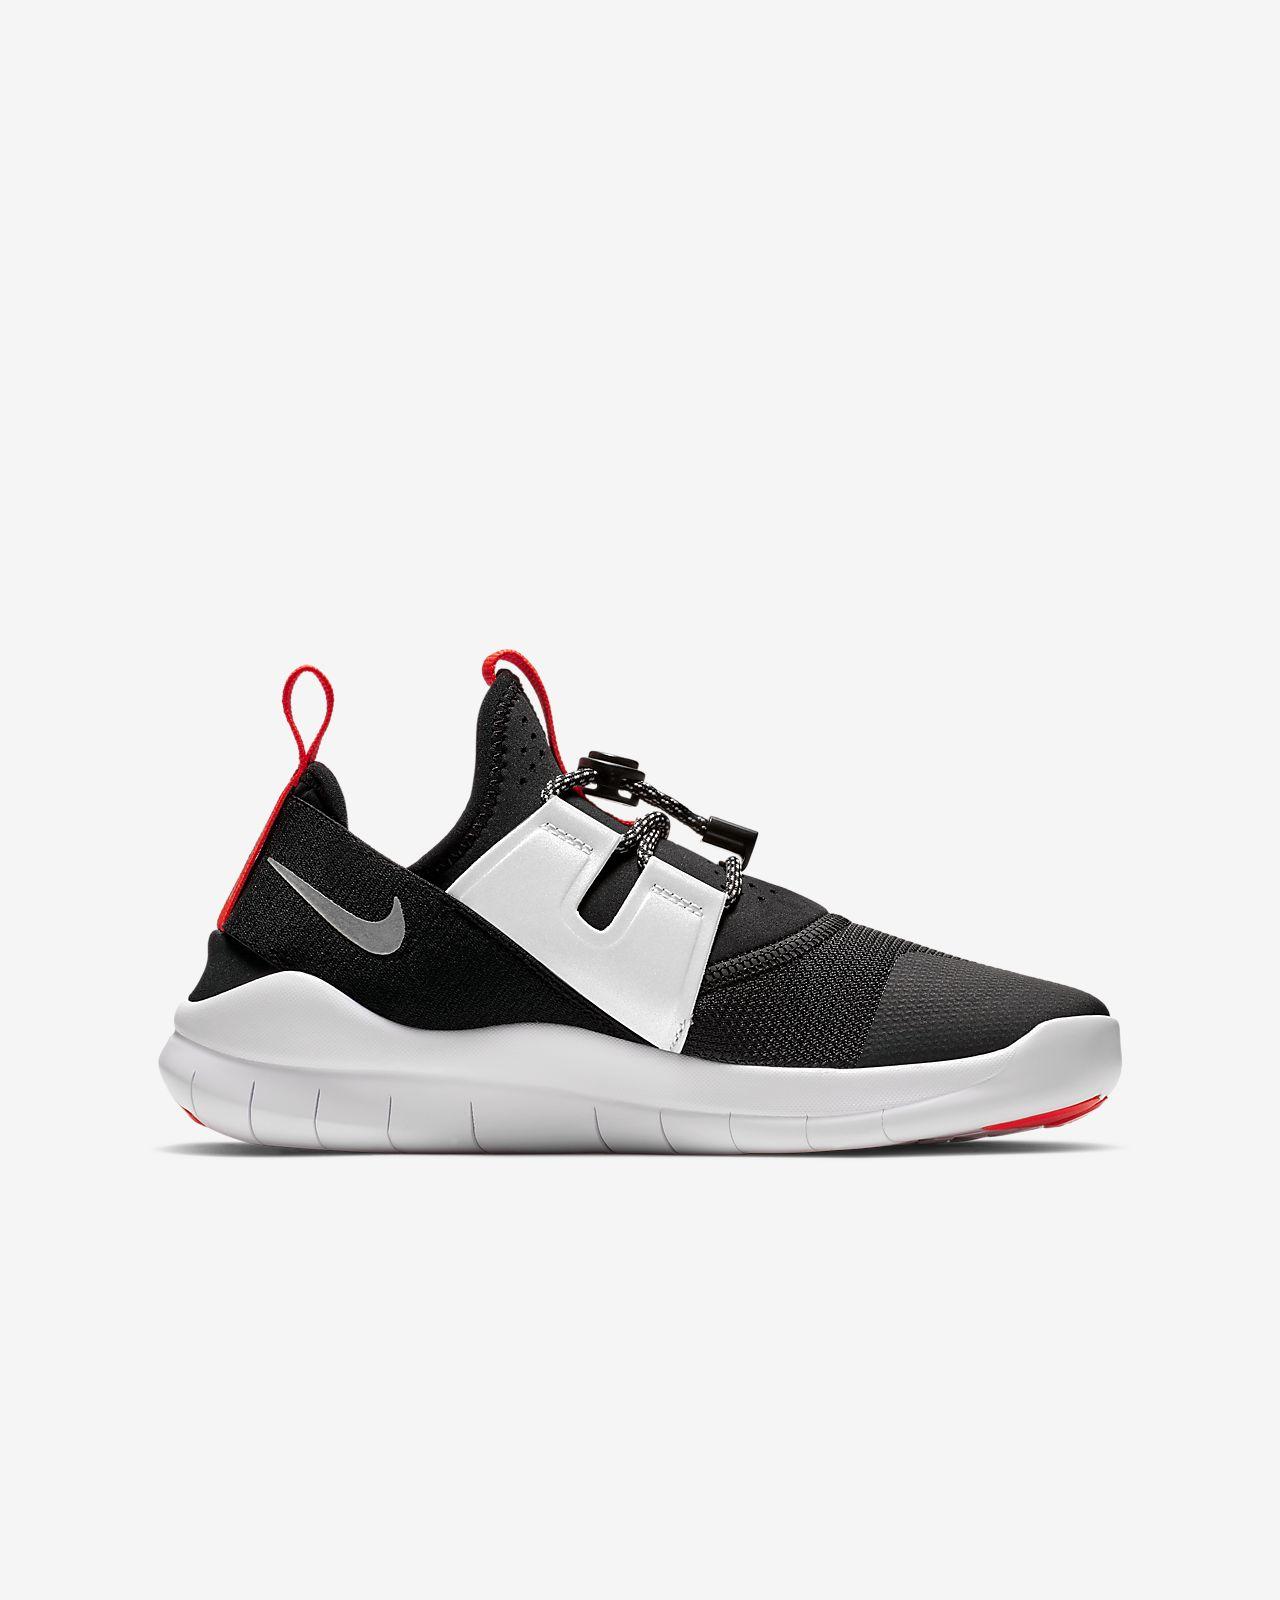 new products 89391 ea0b4 Nike Free RN Commuter 2018 JDI Big Kids Running Shoe ...